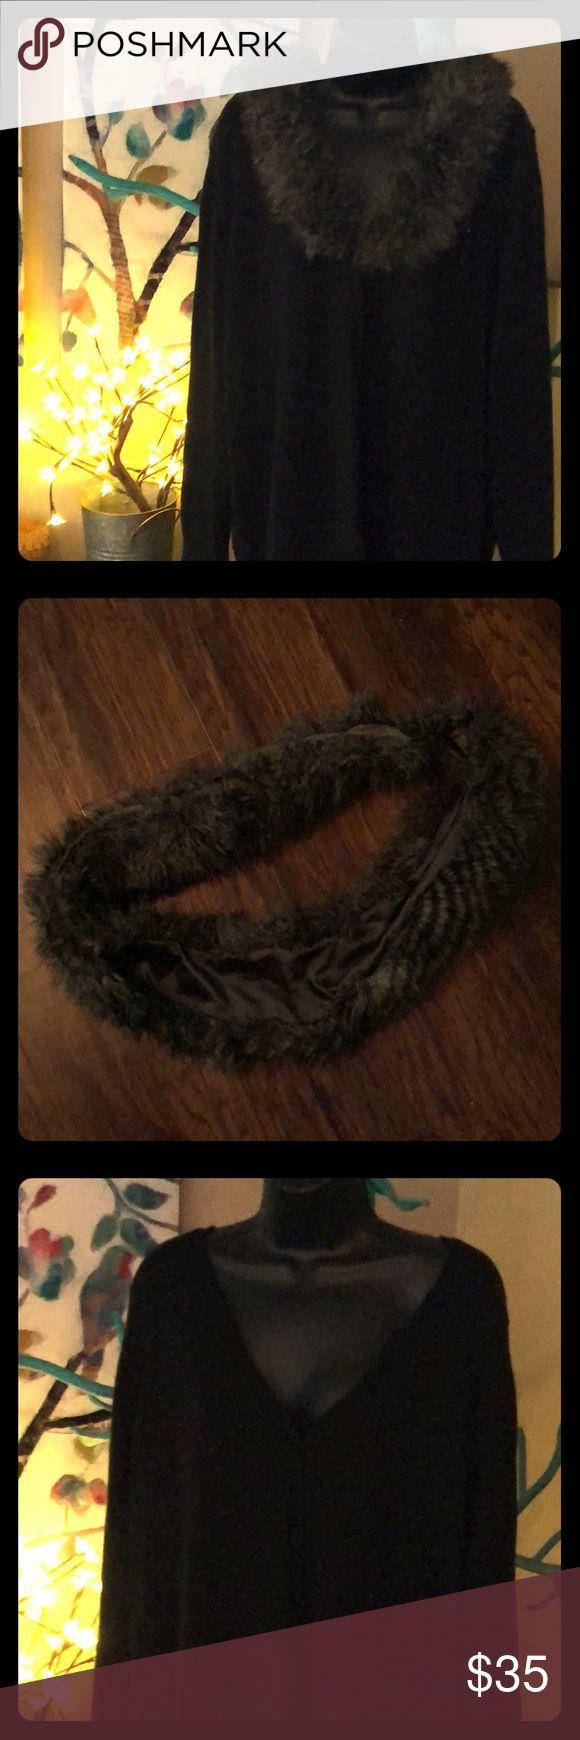 💕Coldwater Creek, 20/22W, black cardigan w/ fur 💕Coldwater Creek, 20/22W, black cardigan w/ removable faux fur collar Coldwater Creek Sweaters Cardigans